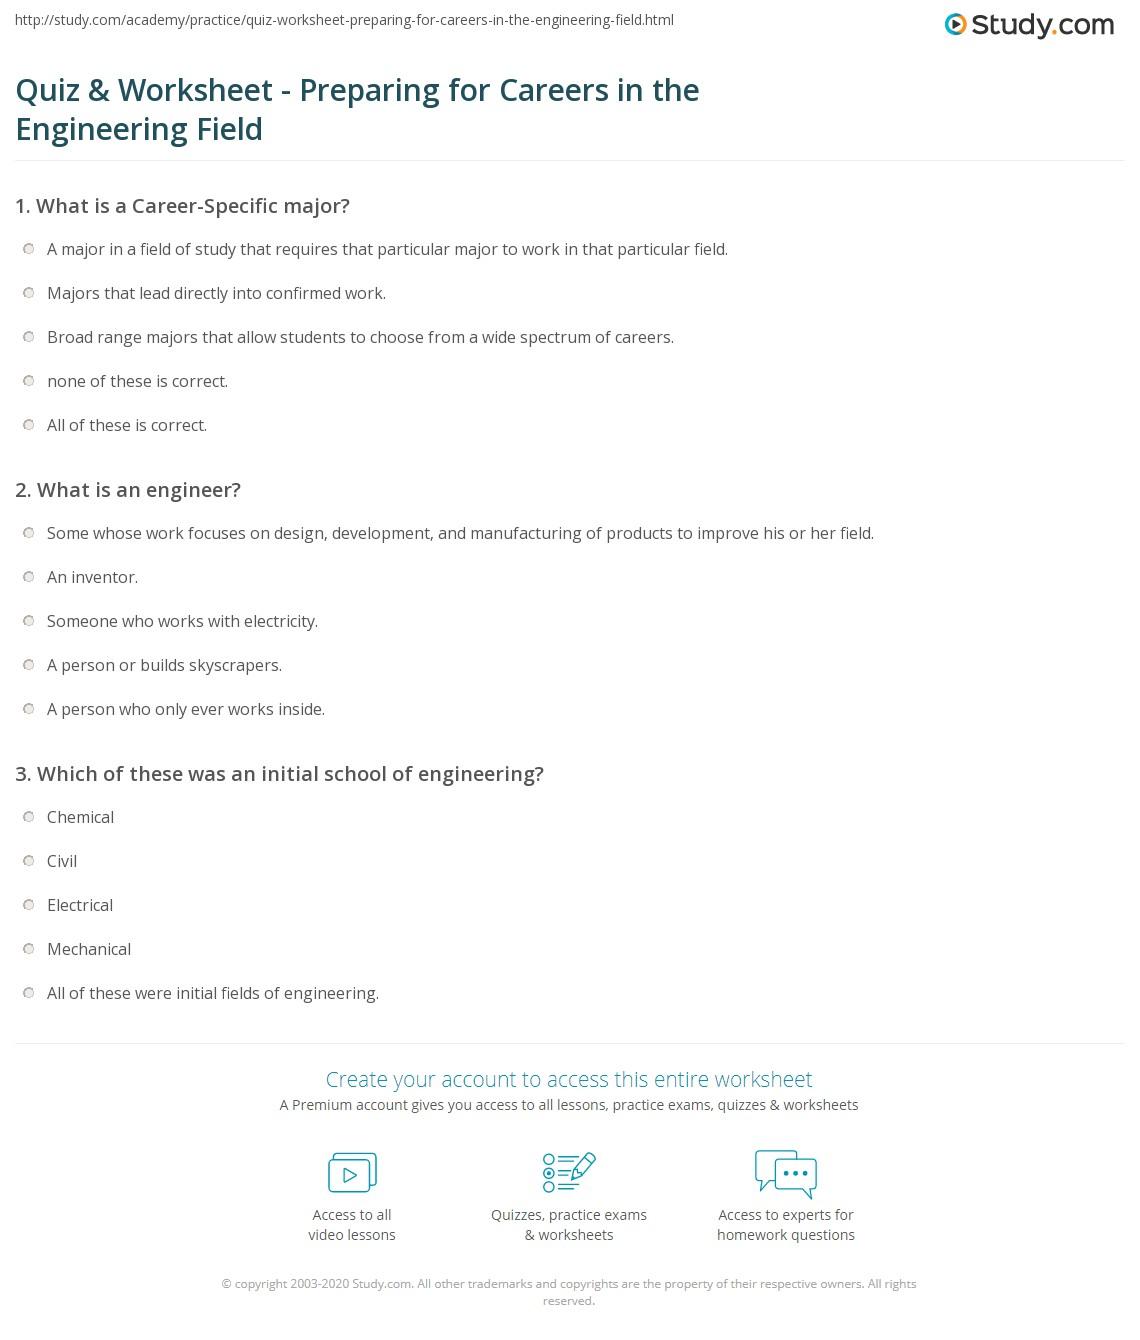 Printables Career Worksheets For Middle School quiz worksheet preparing for careers in the engineering field print typical courses degrees worksheet